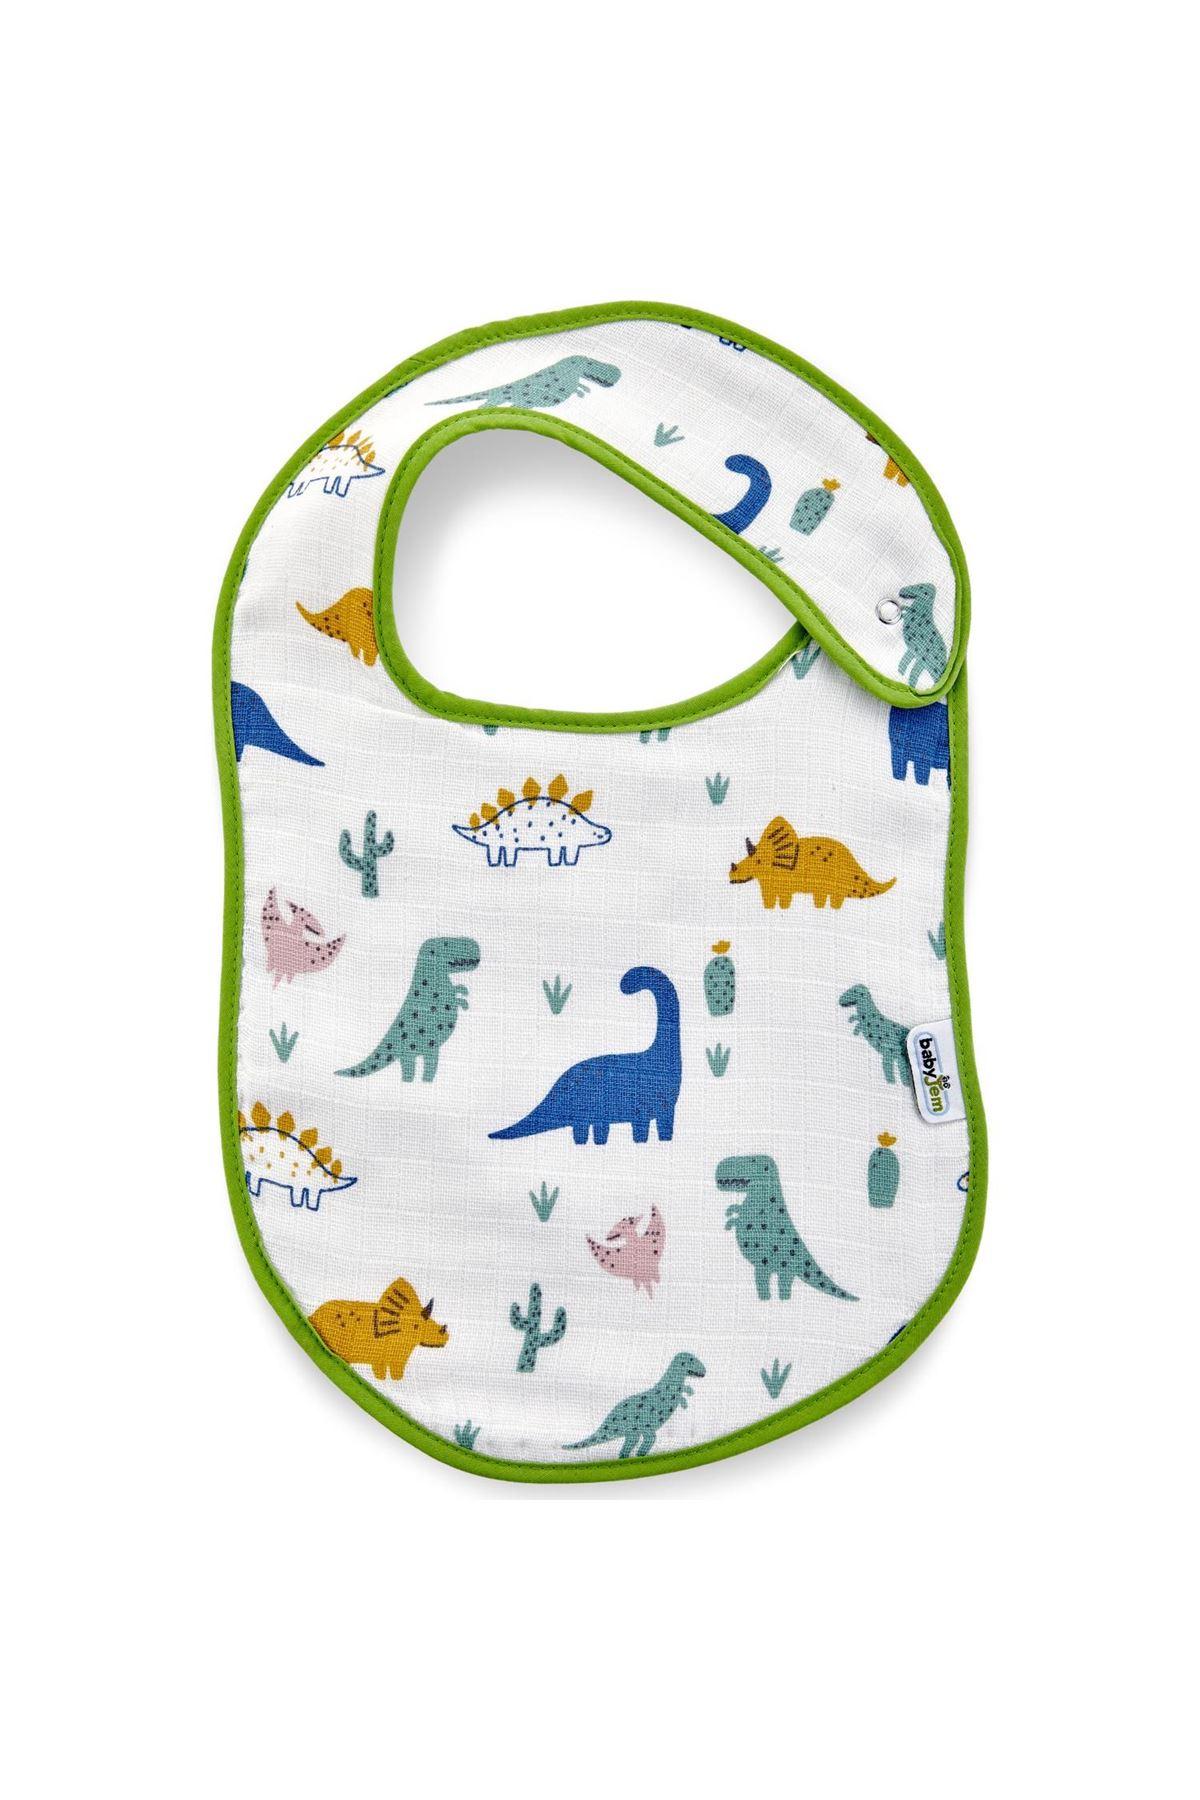 BabyJem Müslin Önlük 379 Dino